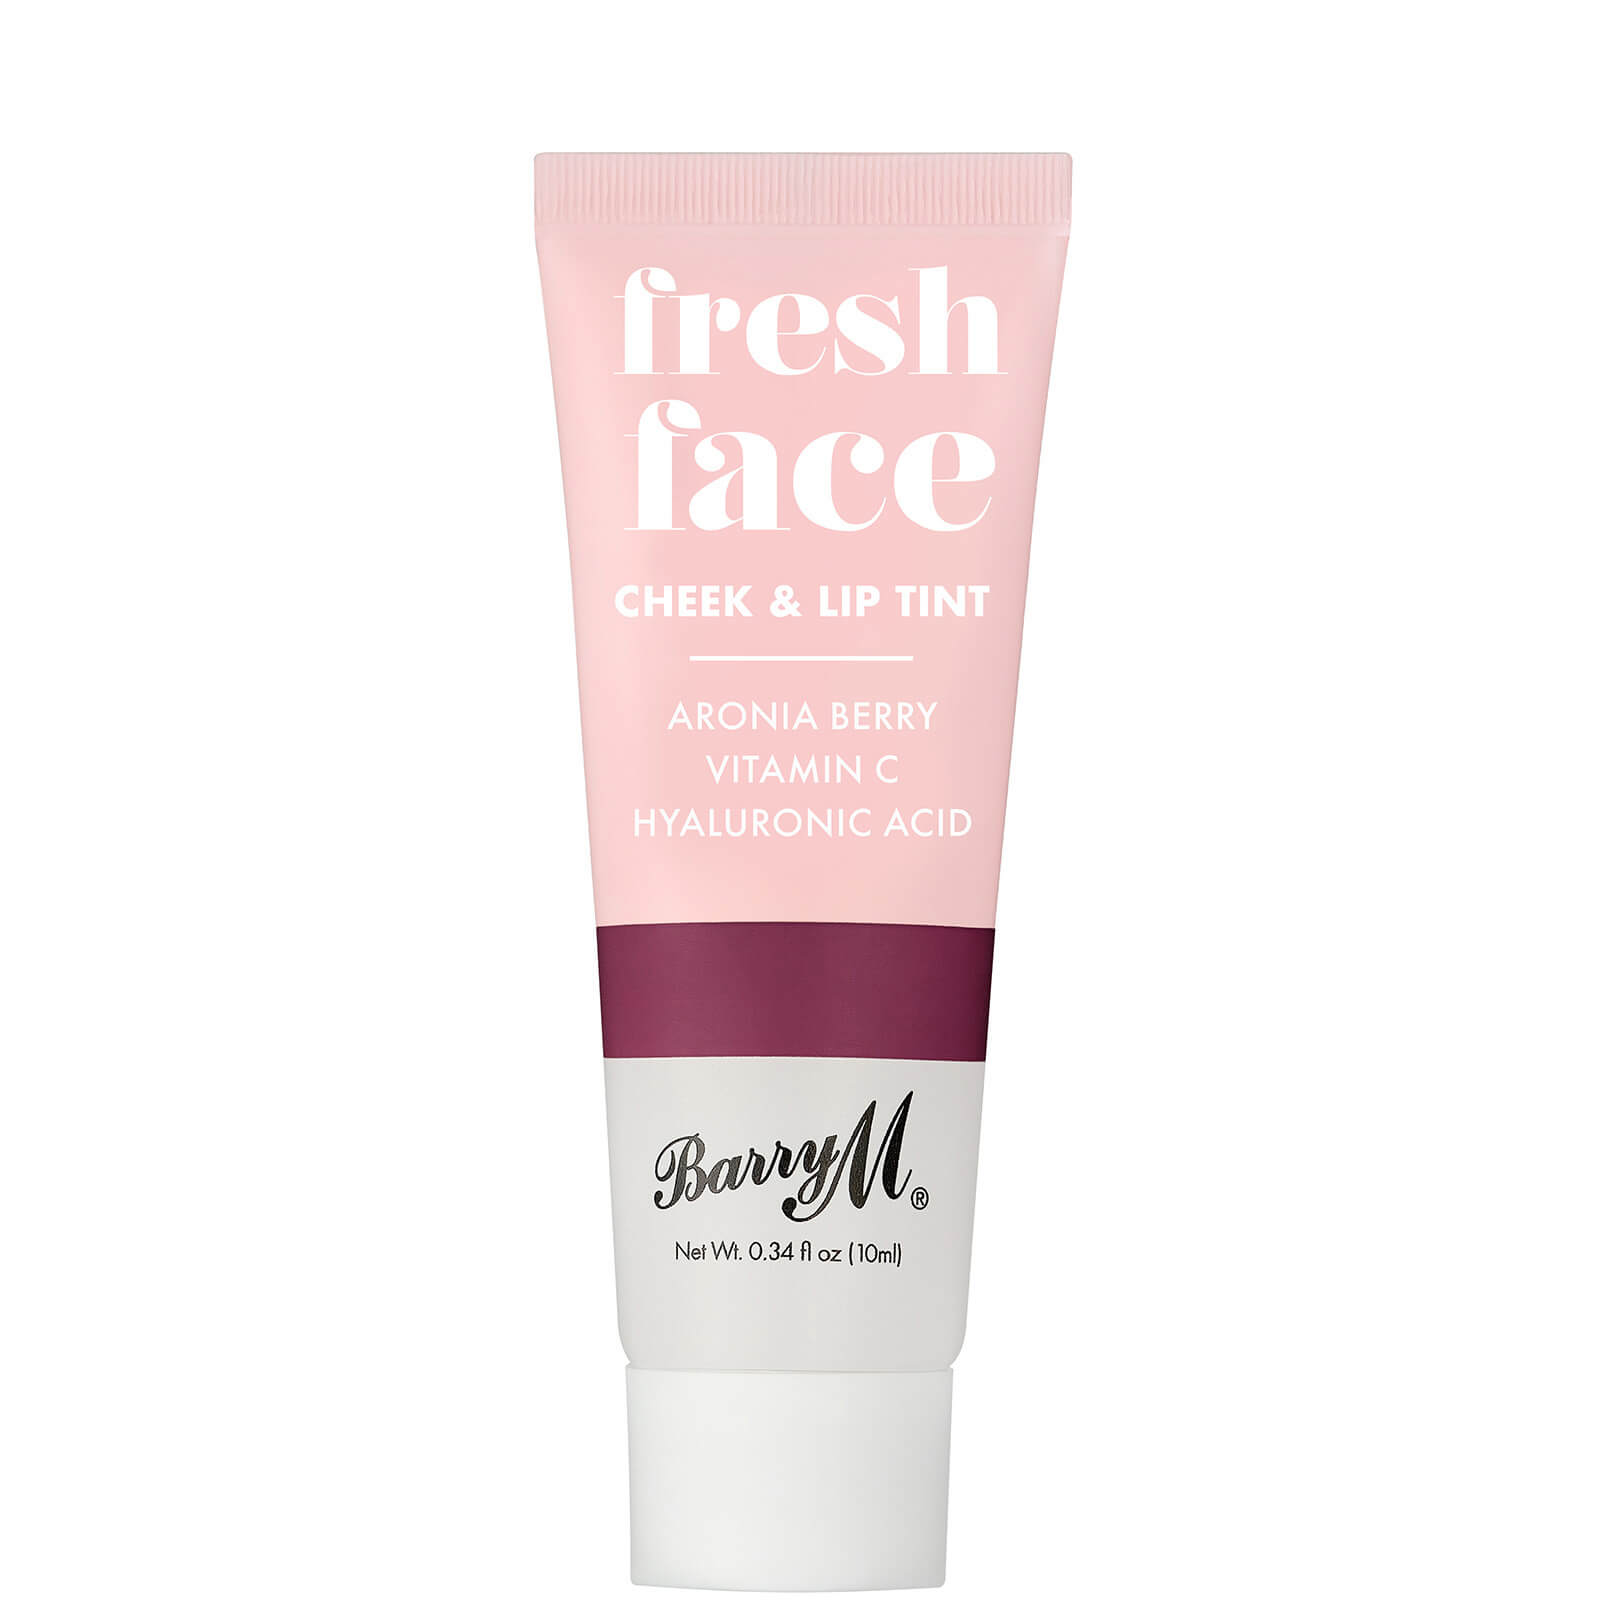 Купить Barry M Cosmetics Fresh Face Cheek and Lip Tint 10ml (Various Shades) - Blackberry